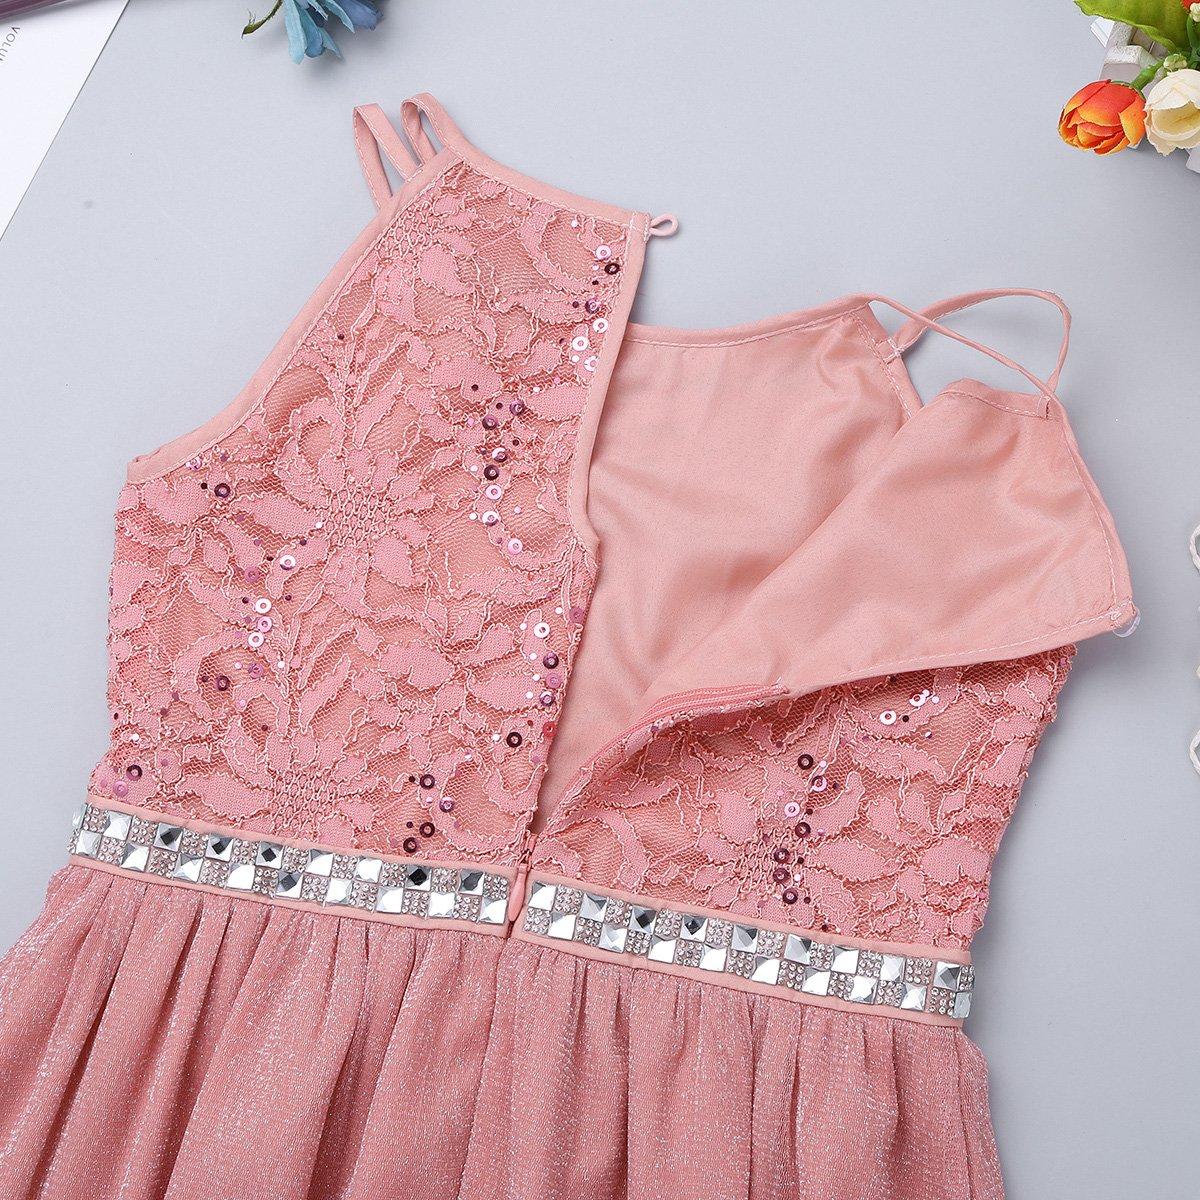 iiniim Girls Sequined Lace Chiffon Sleeveless Flower Girl Dress Wedding Princess Pageant Bridesmaid Birthday Party Dresses